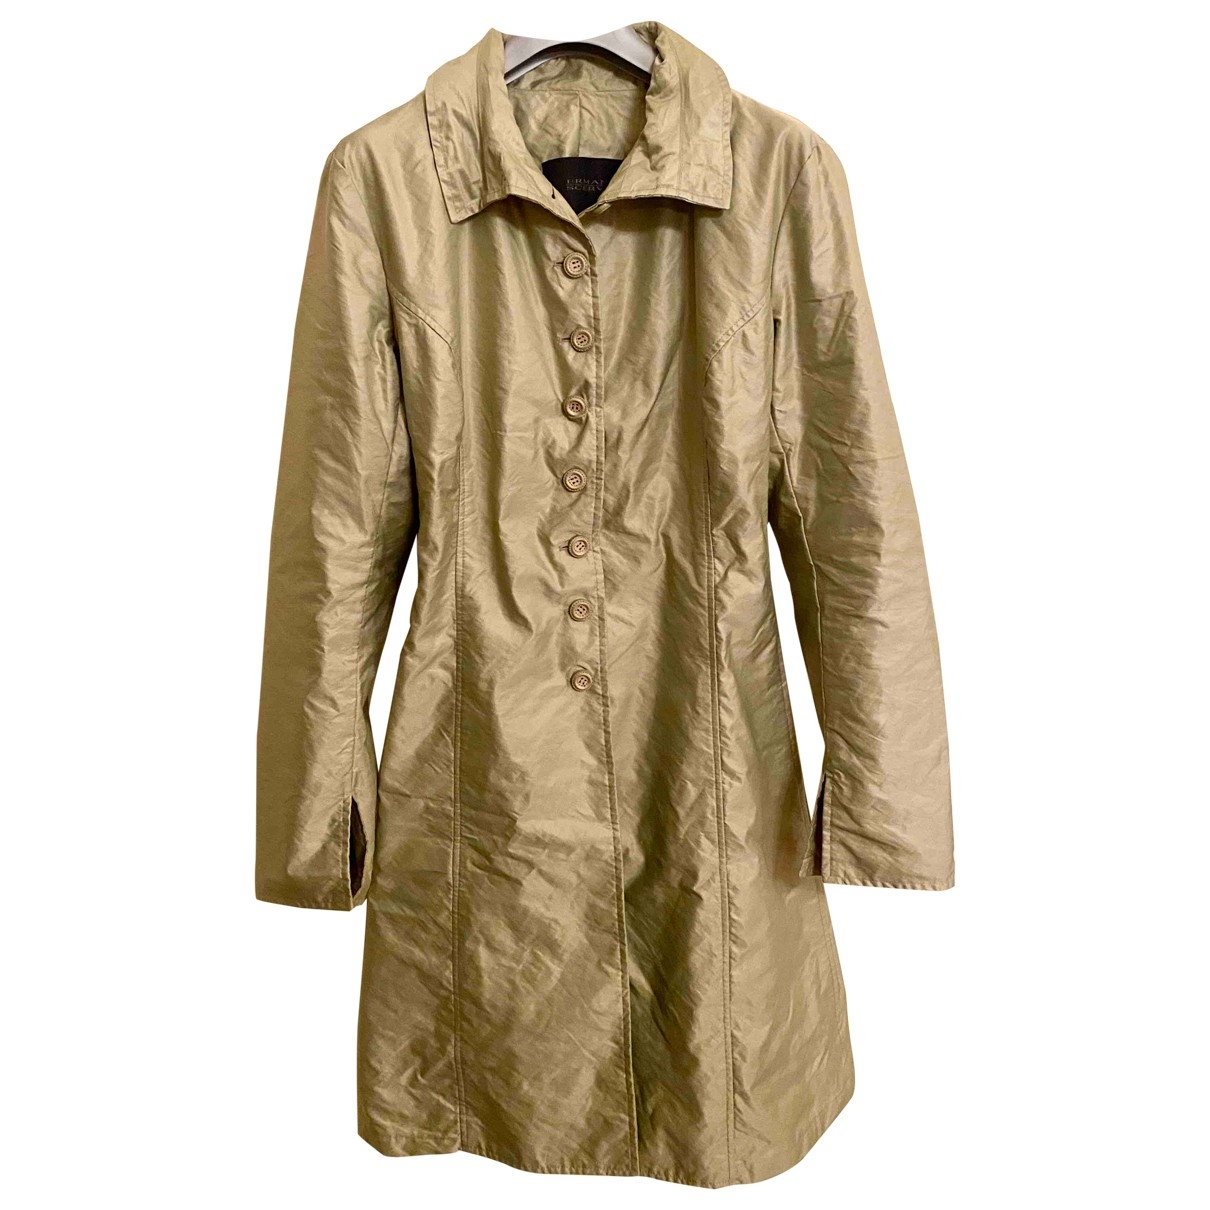 Ermanno Scervino \N jacket for Women 44 IT